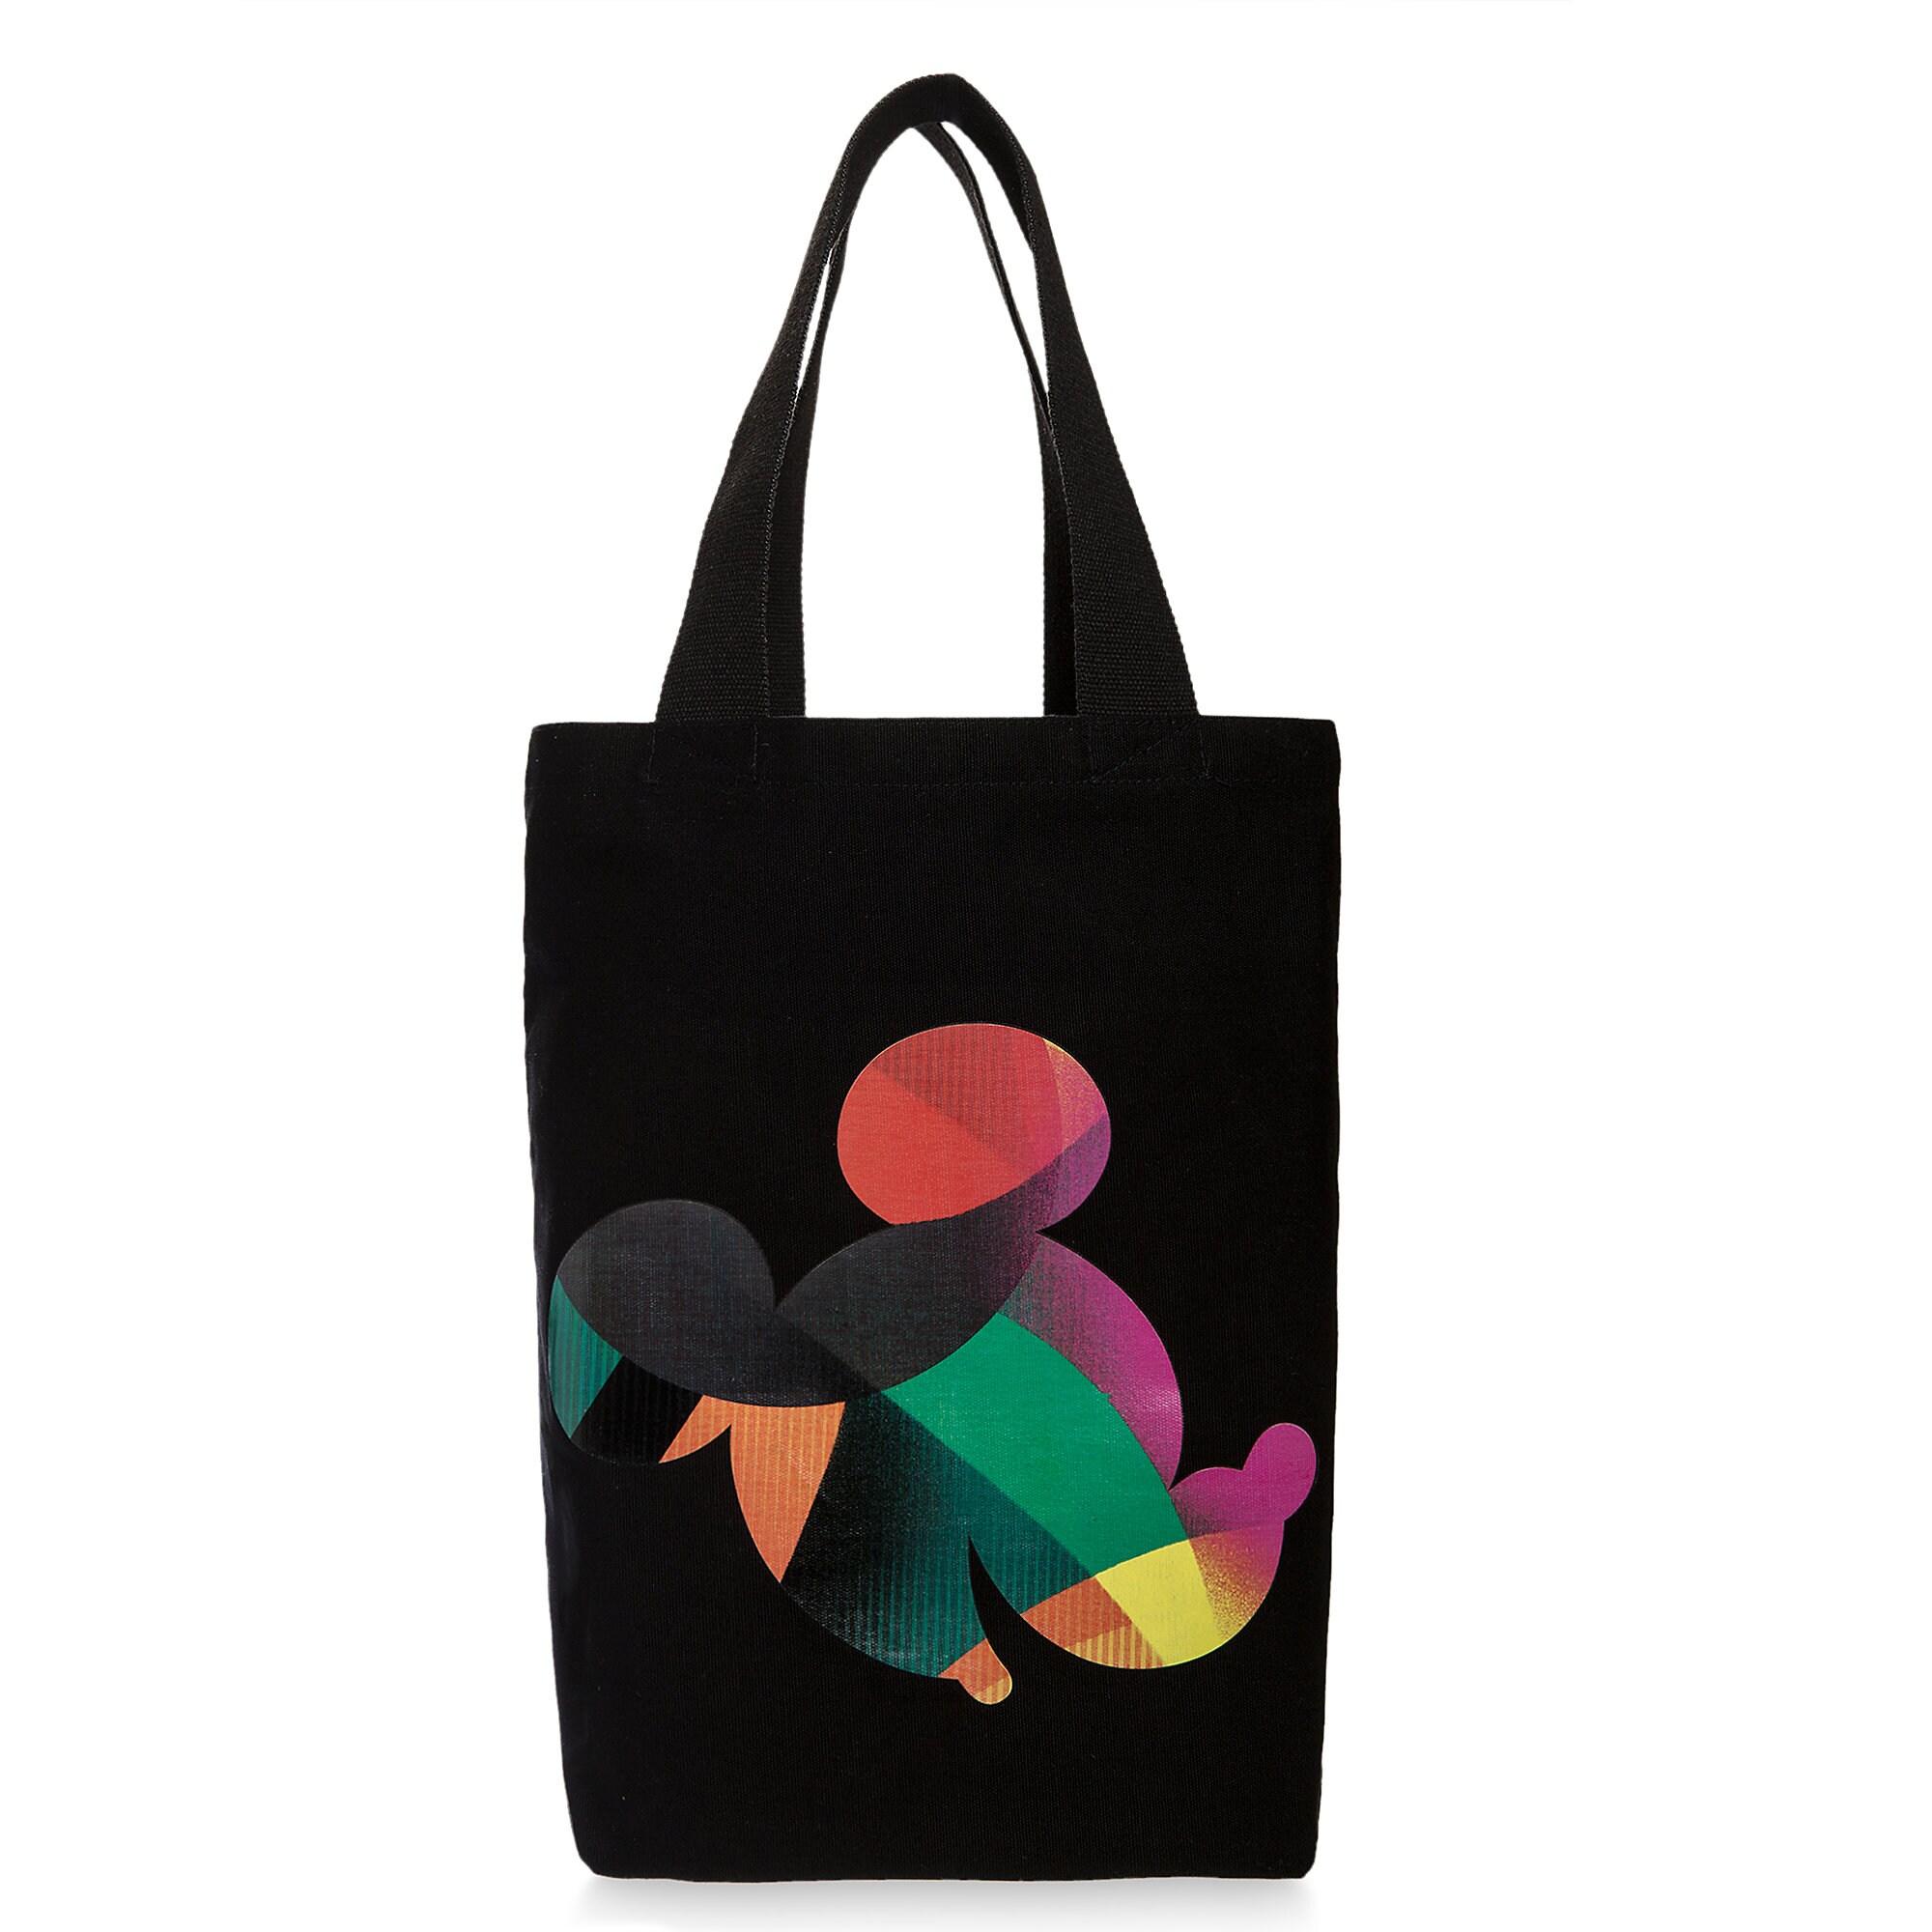 b01b889bff Mickey Mouse The True Original Canvas Tote Bag - Black